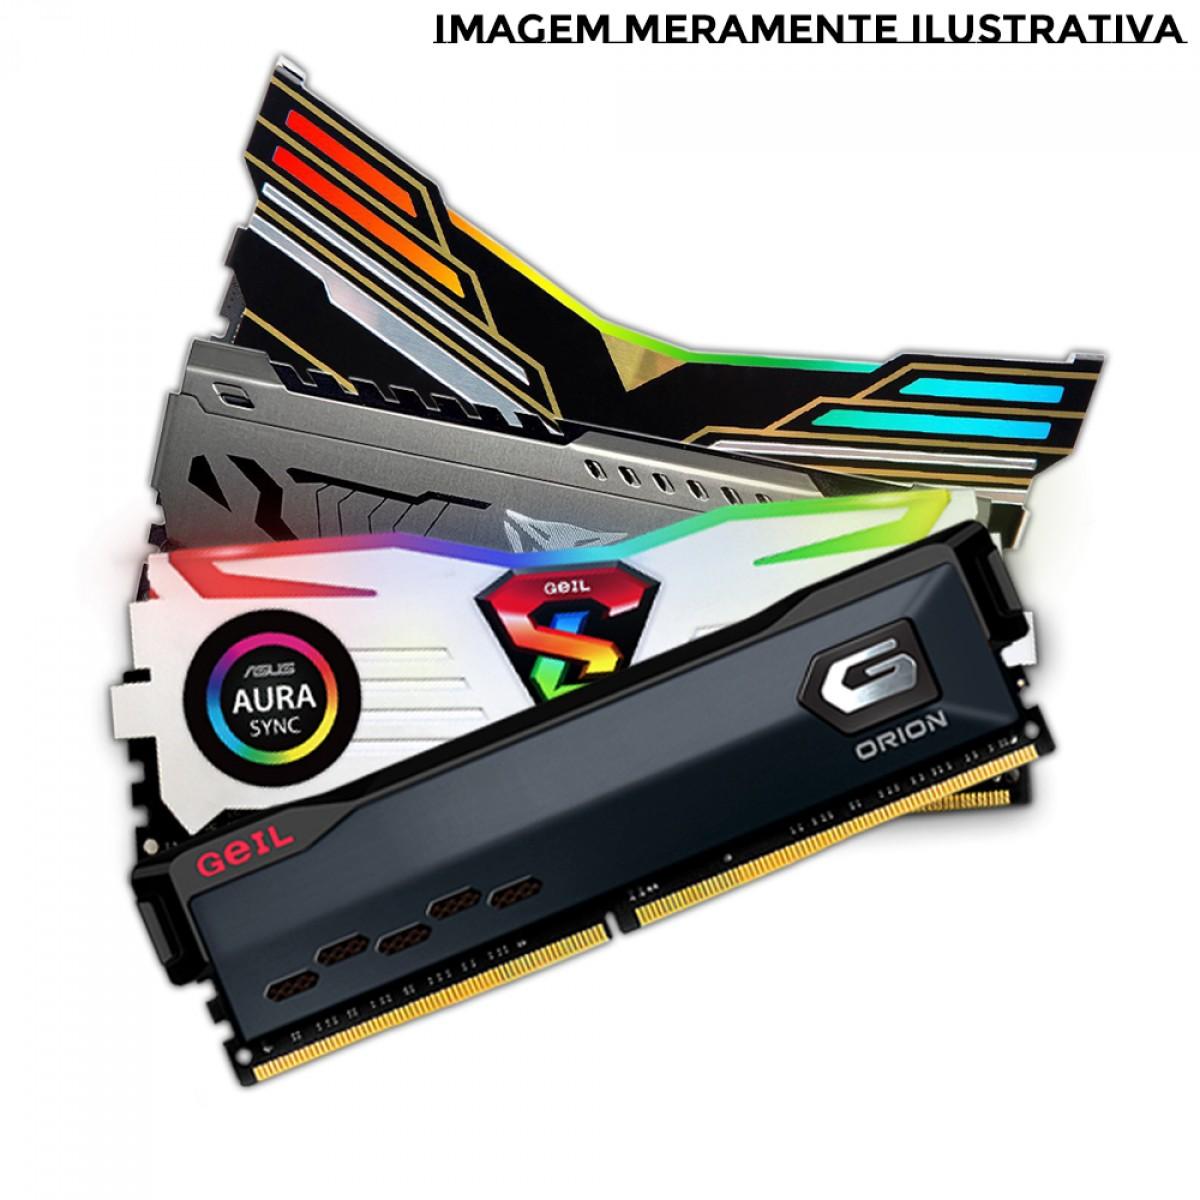 Kit Upgrade, GIGABYTE B450M GAMING + AMD Ryzen 5 3400G + Memória DDR4 8GB 3000MHz